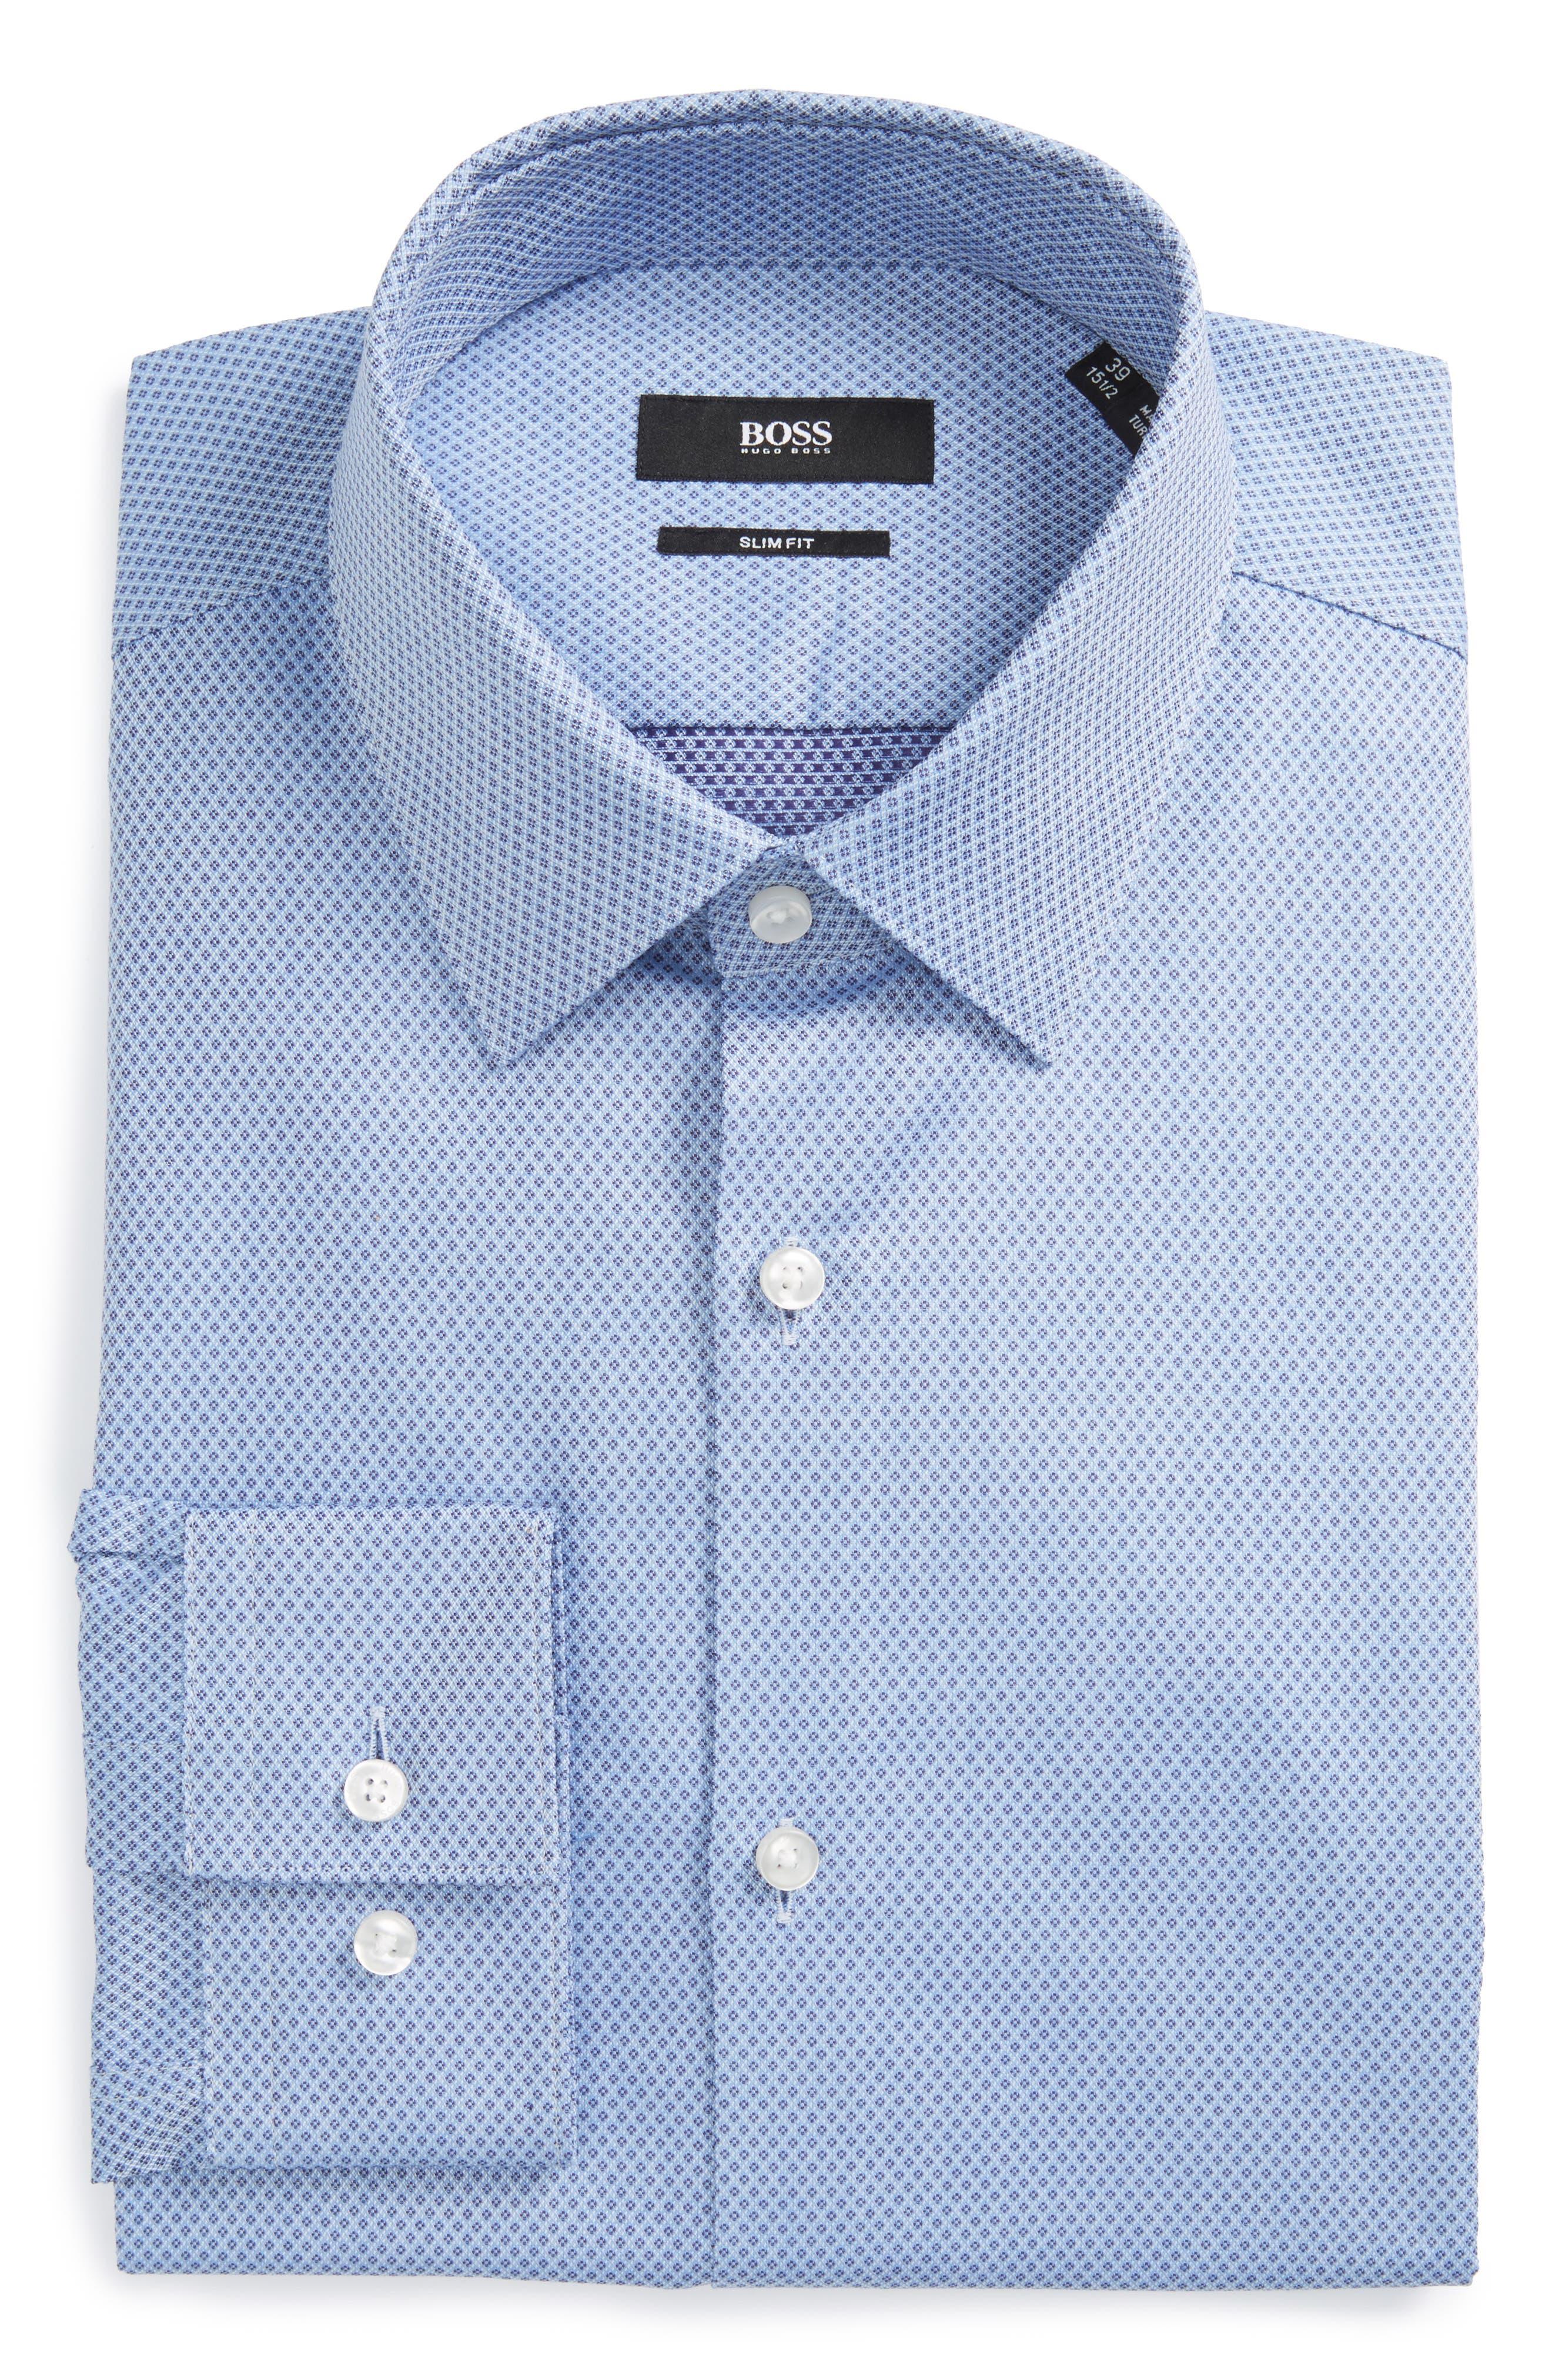 Isko Slim Fit Geometric Dress Shirt,                         Main,                         color, Light Past/ Blue